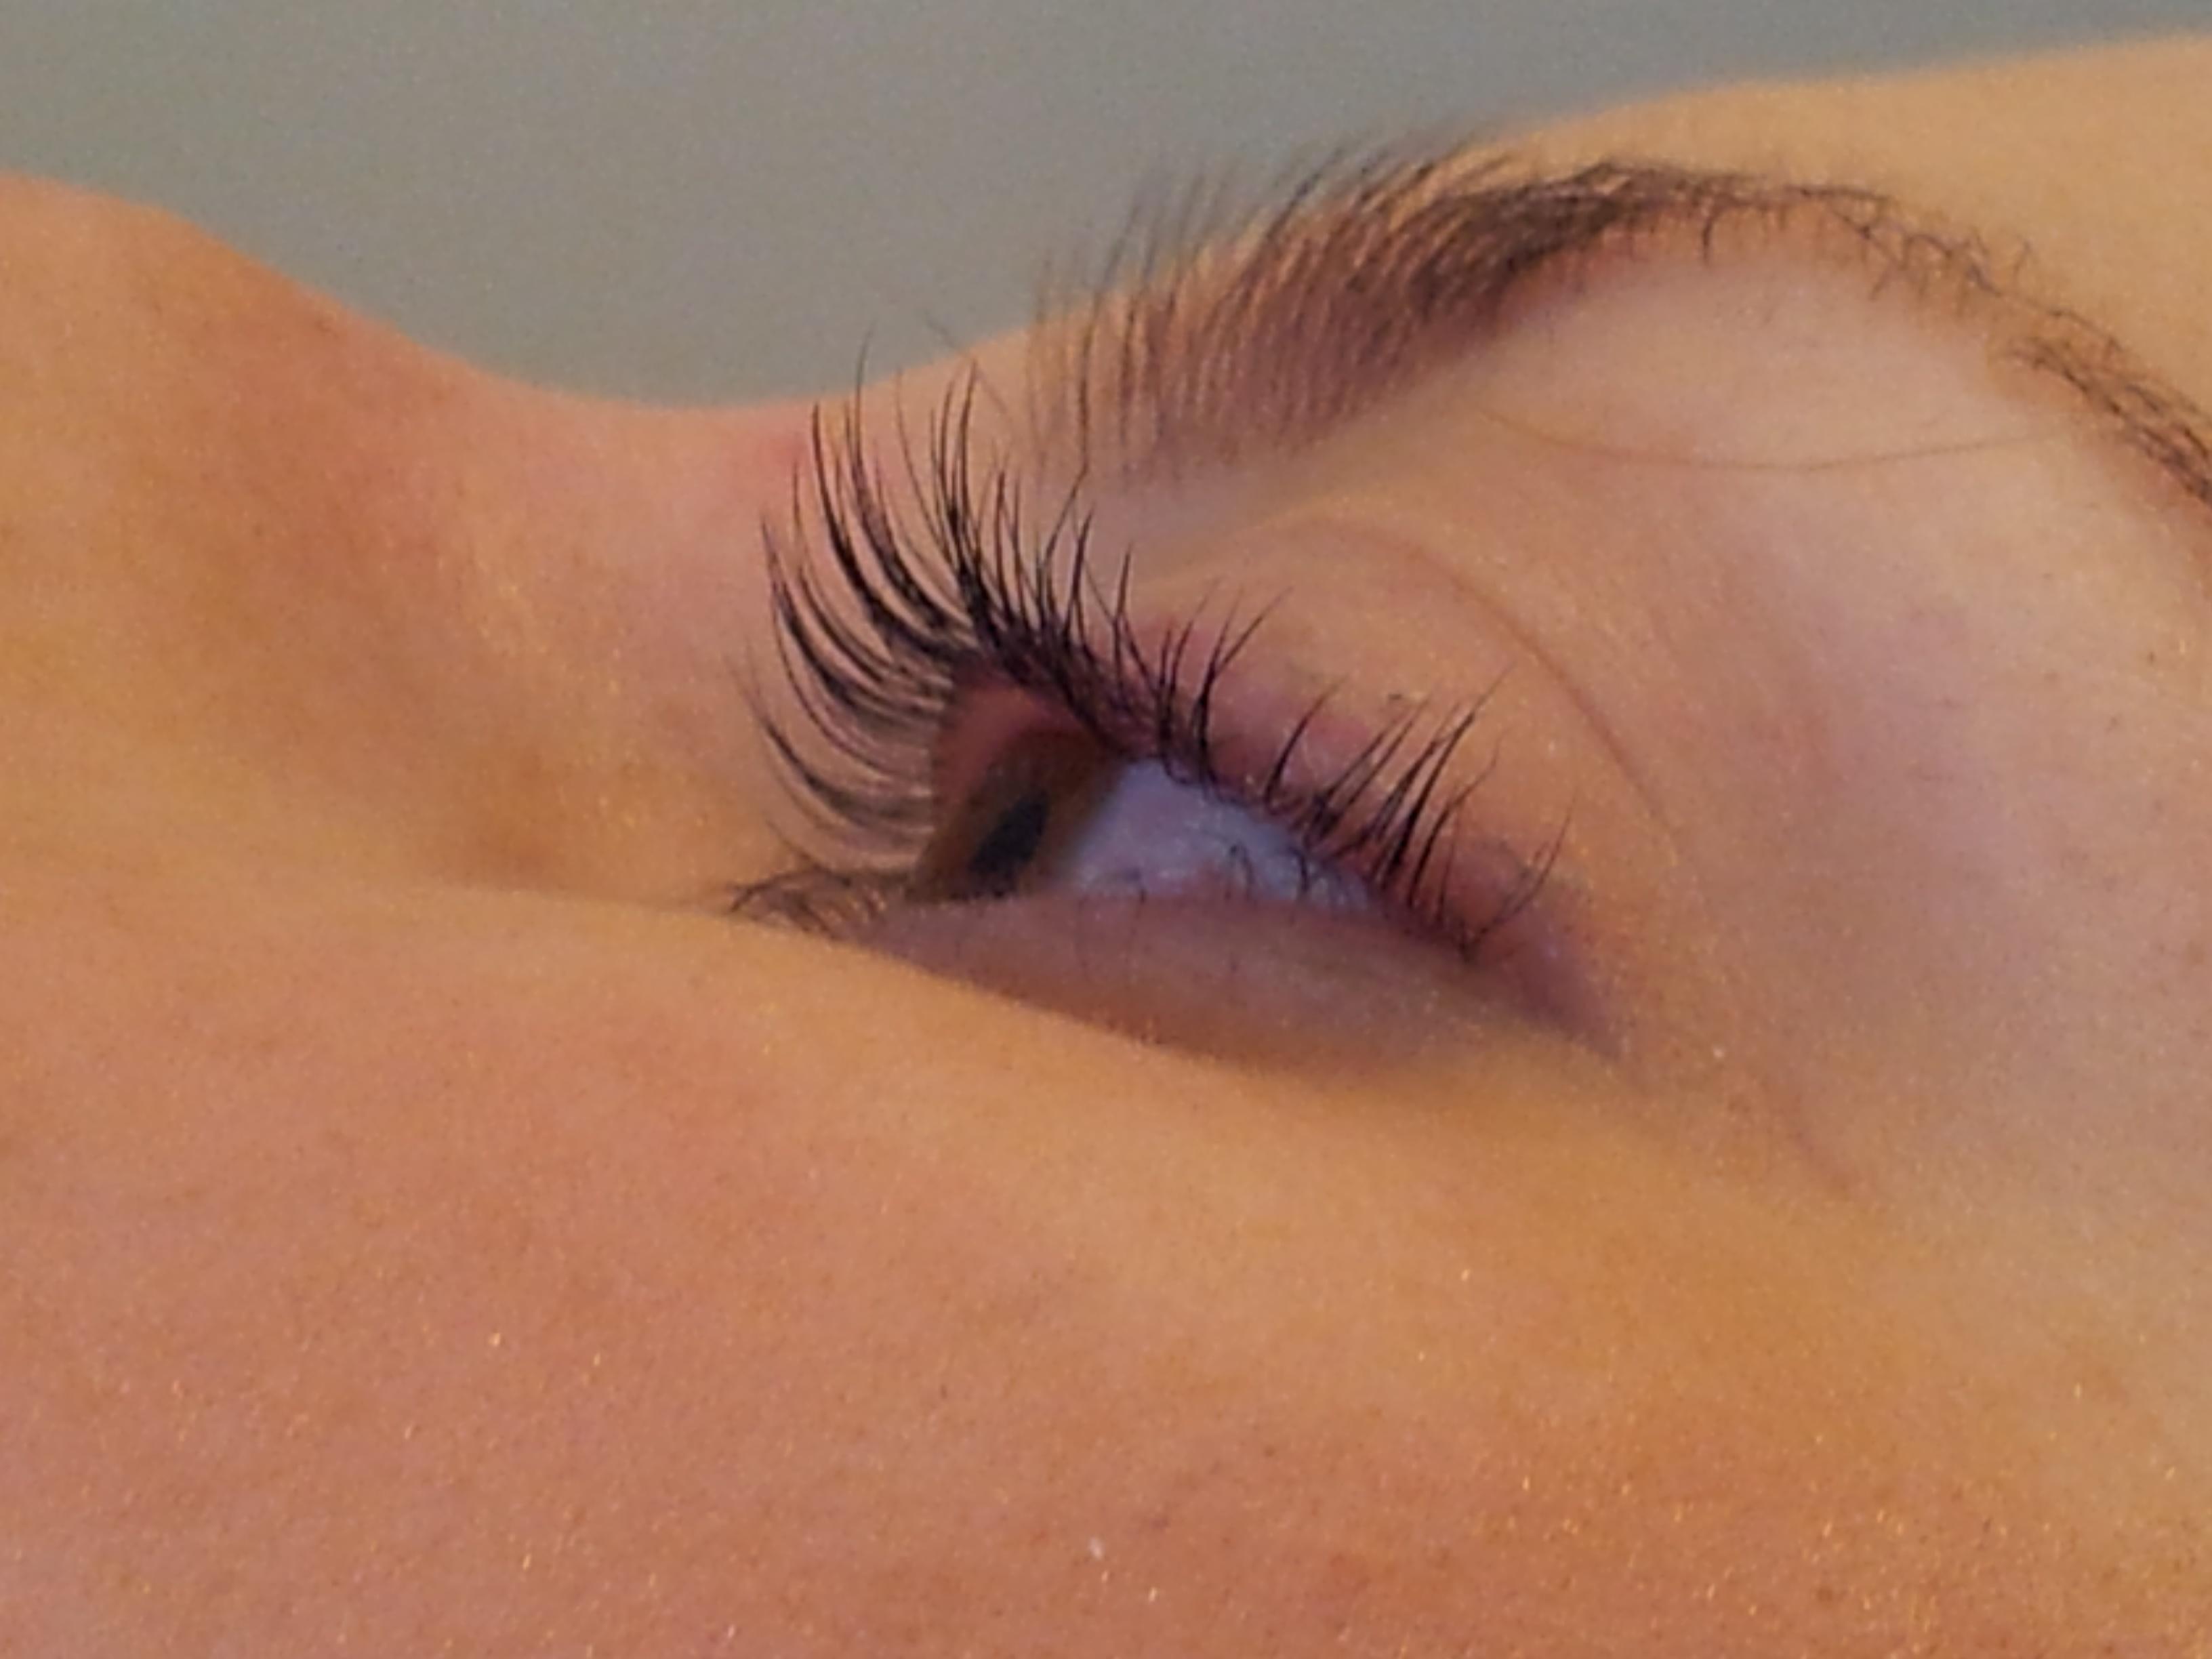 Express Eyelash Extensions After Eyelash Extensions